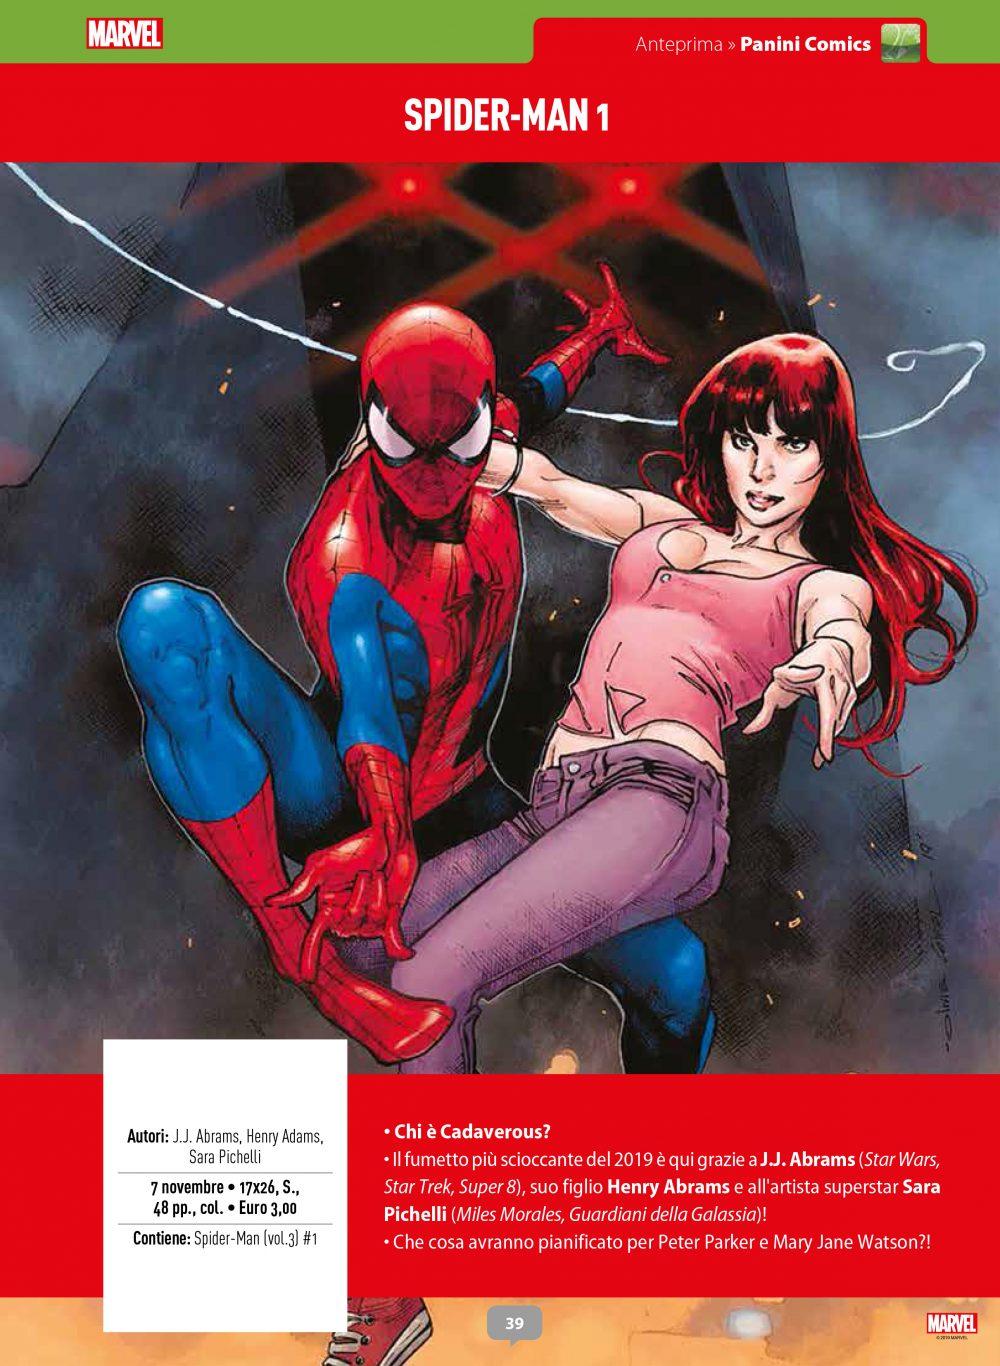 Spider-Man su Anteprima